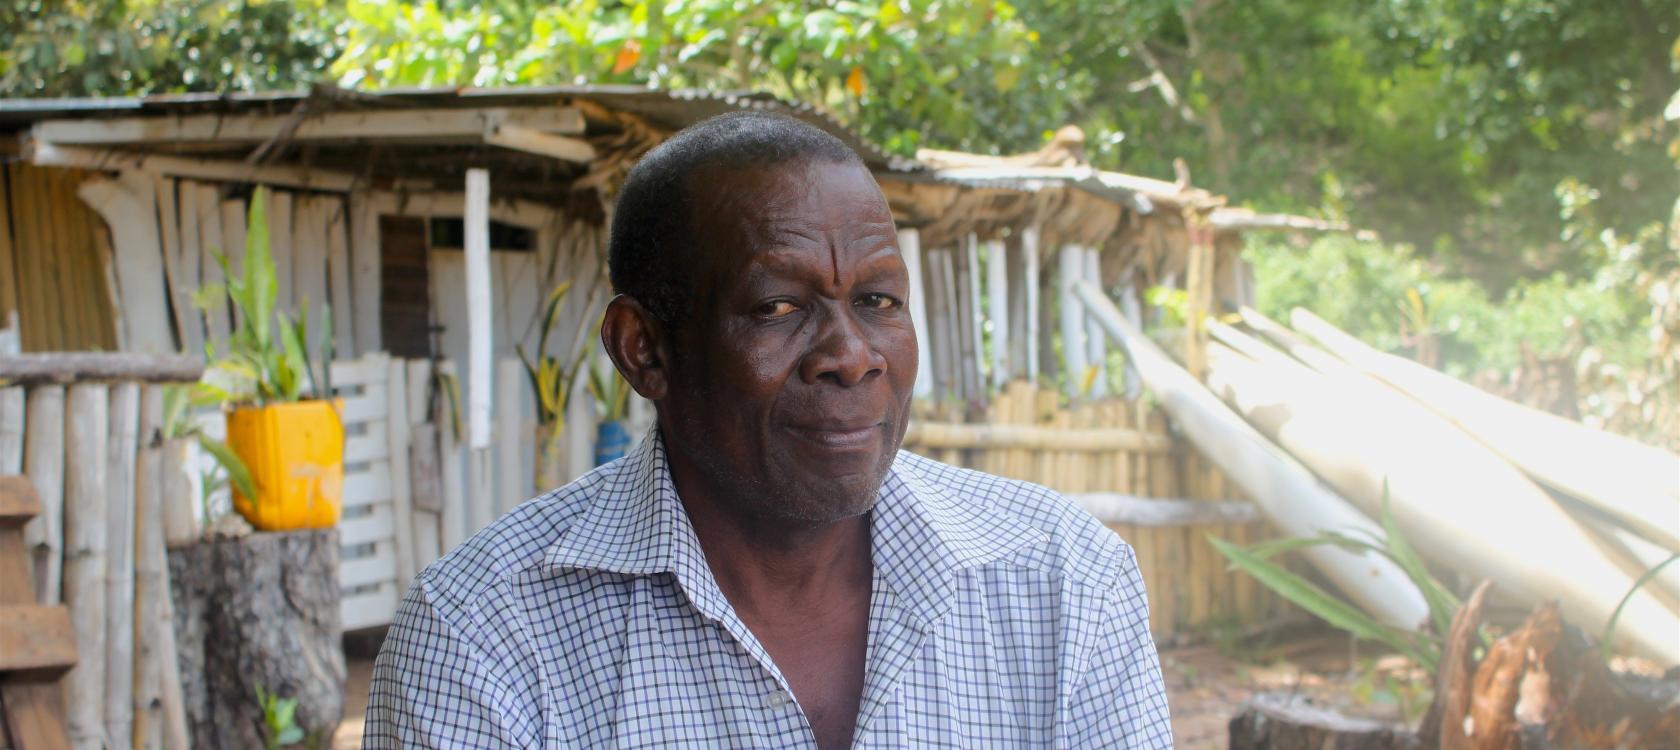 Mayotte la p che au microcr dit relance l 39 conomie for Chambre consulaire apprentissage